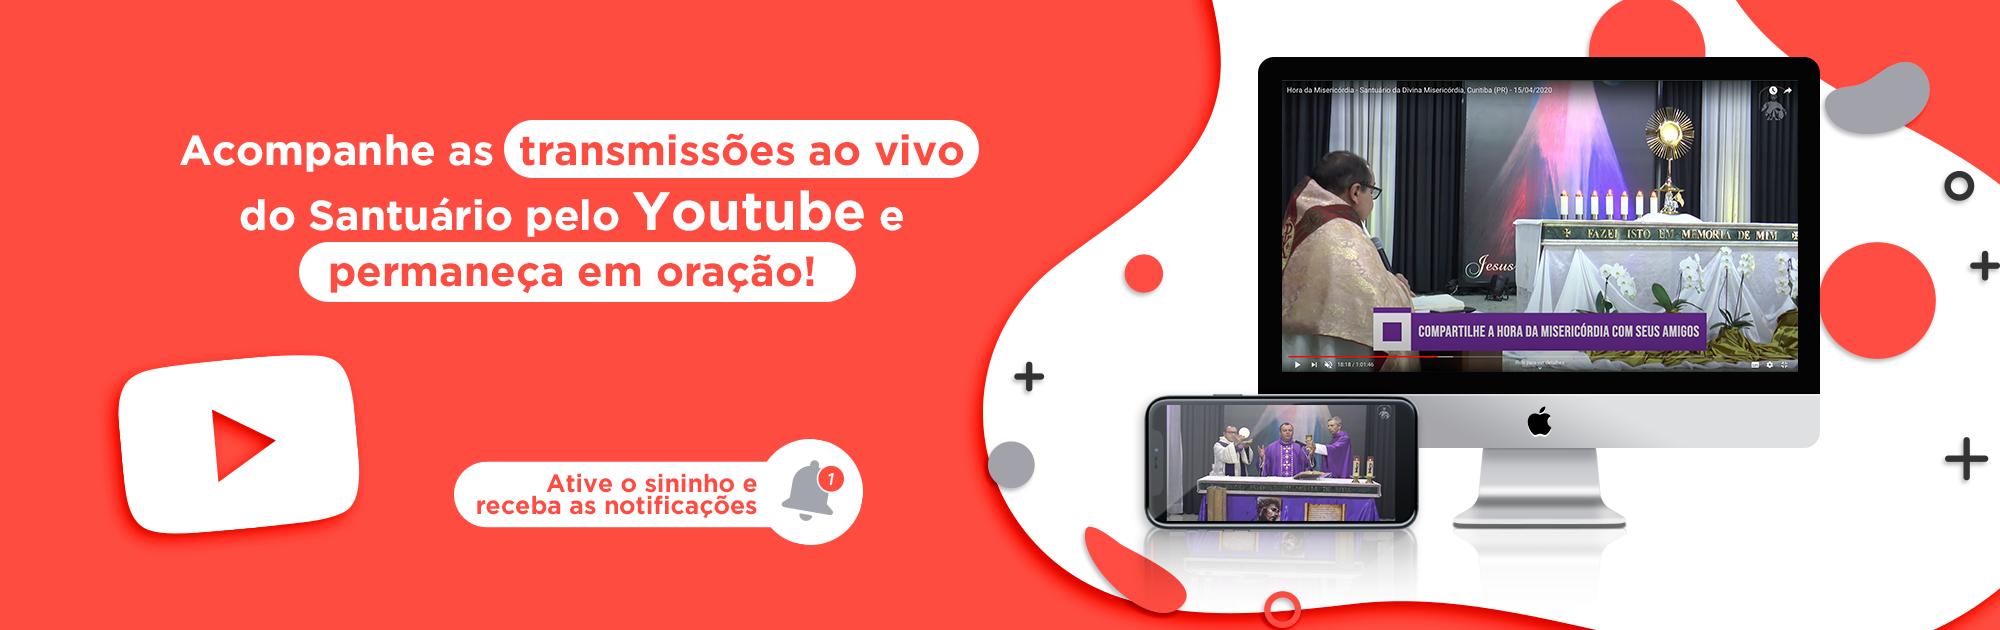 Banner-Blog-Maio-Santuário-da-Divina-Misericórdia